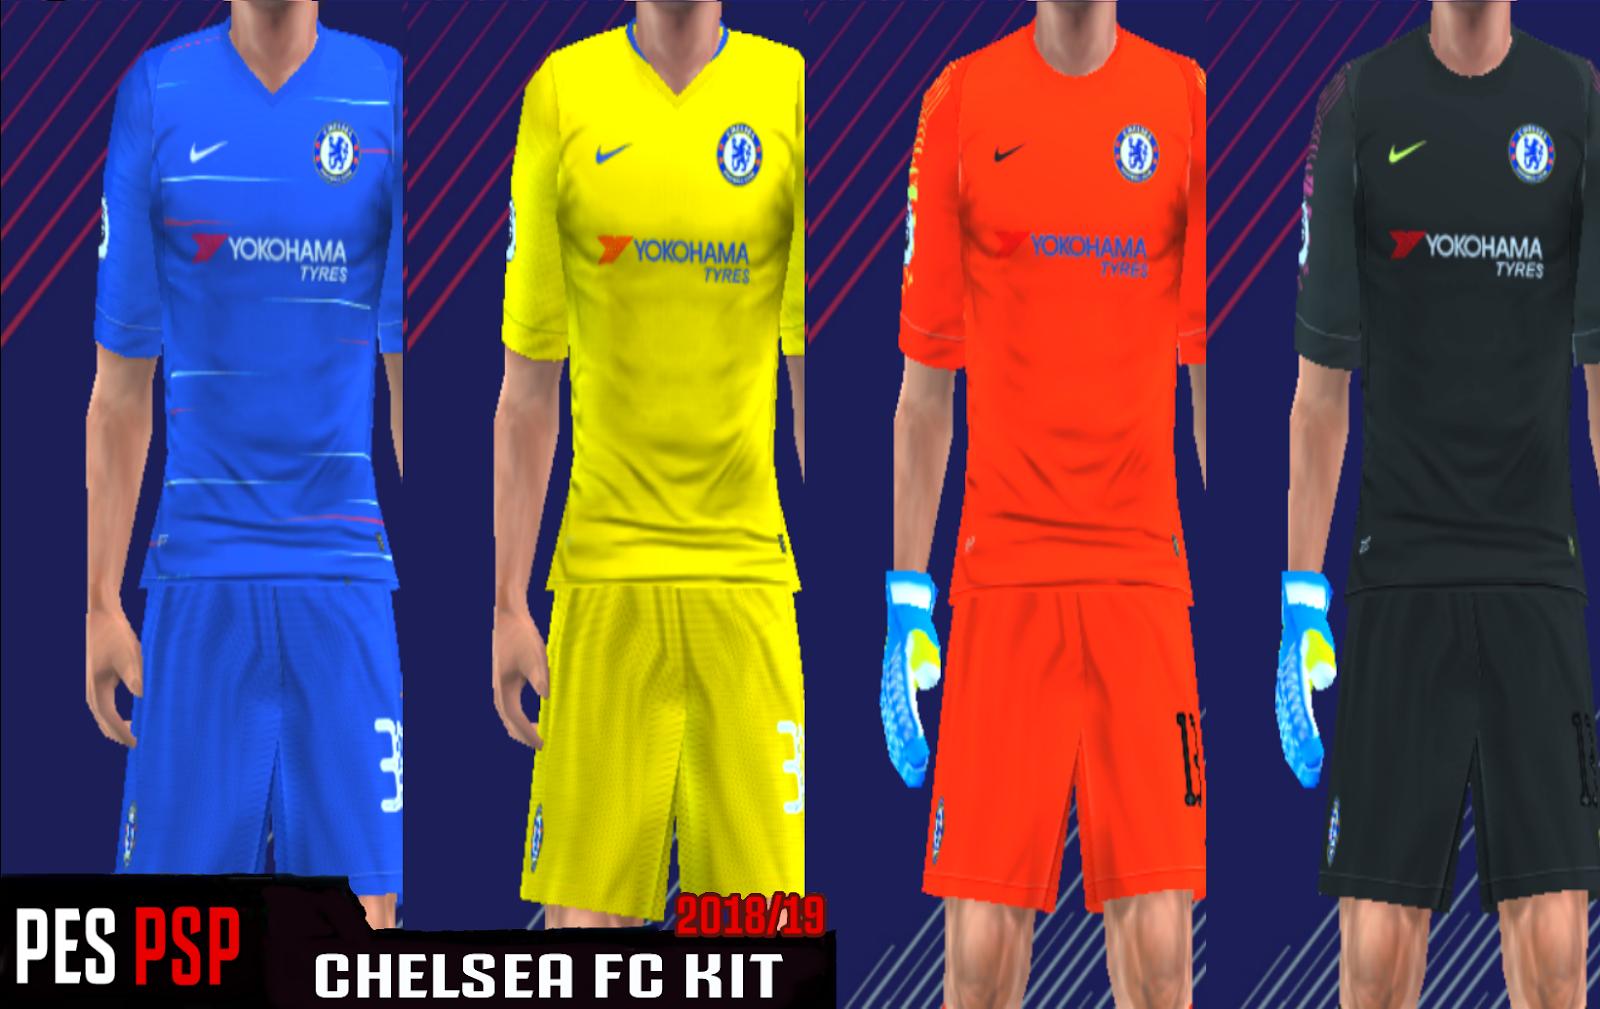 Chelsea fc kit pes 2019